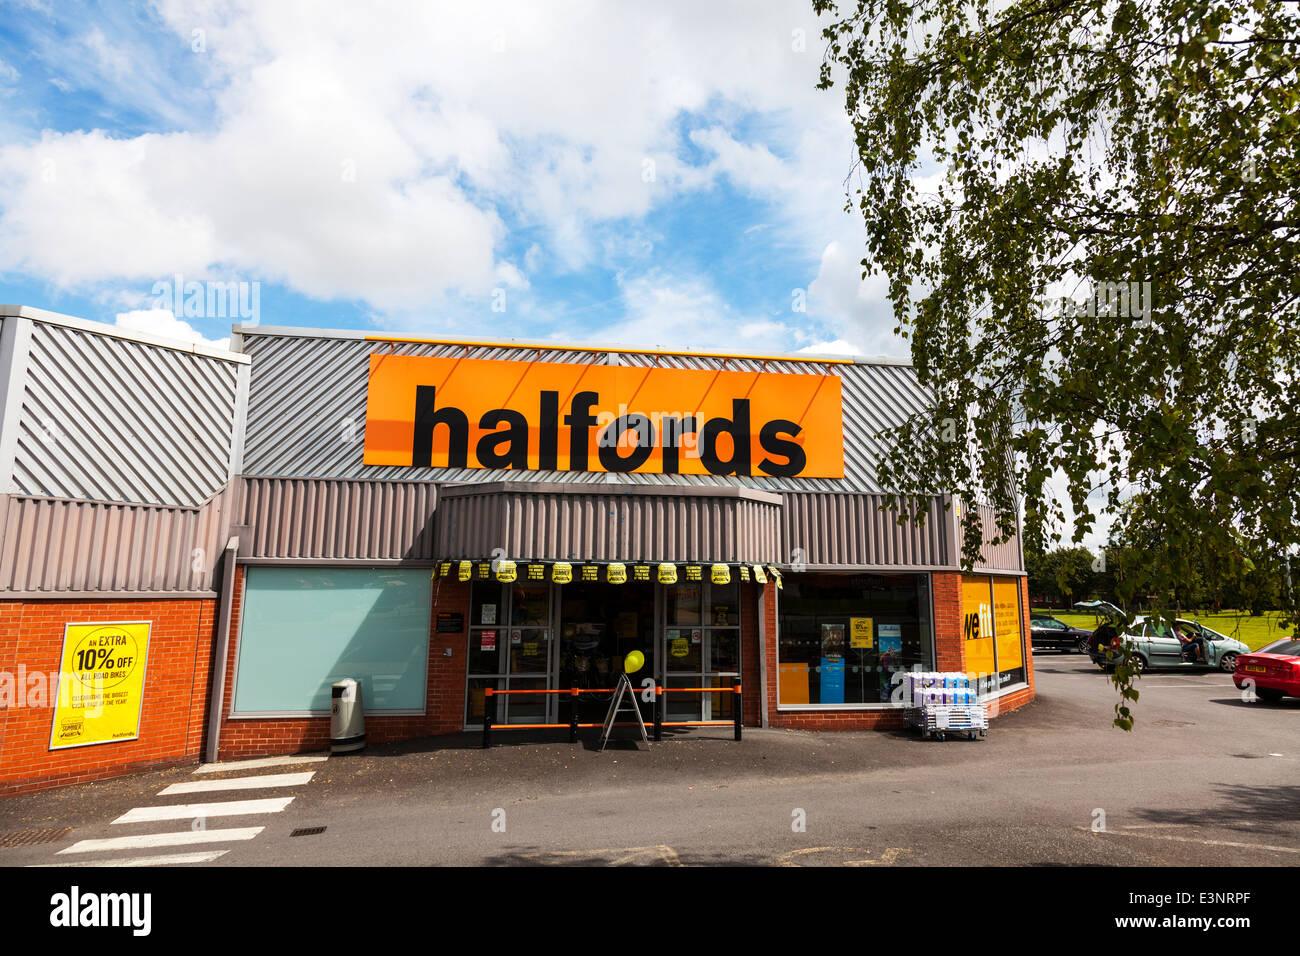 Halfords car supplies store shop front entrance building sign exterior - Stock Image